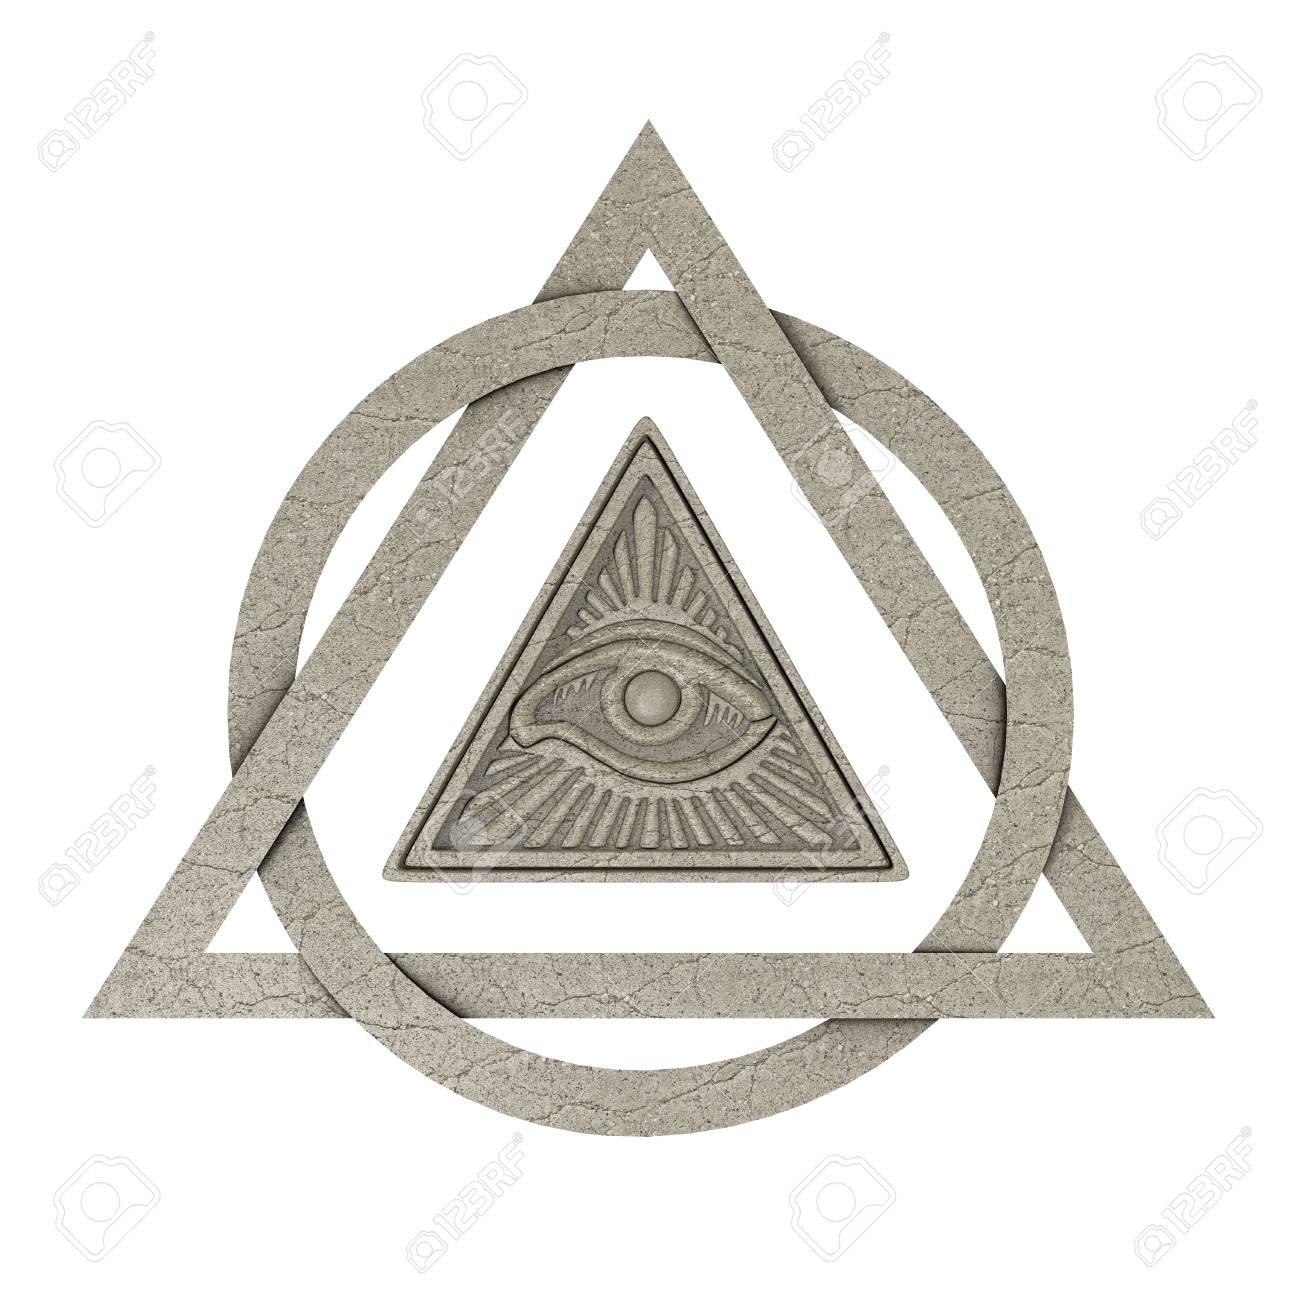 Masonic symbol concept all seeing eye inside pyramid triangle masonic symbol concept all seeing eye inside pyramid triangle as stone on a white background buycottarizona Image collections